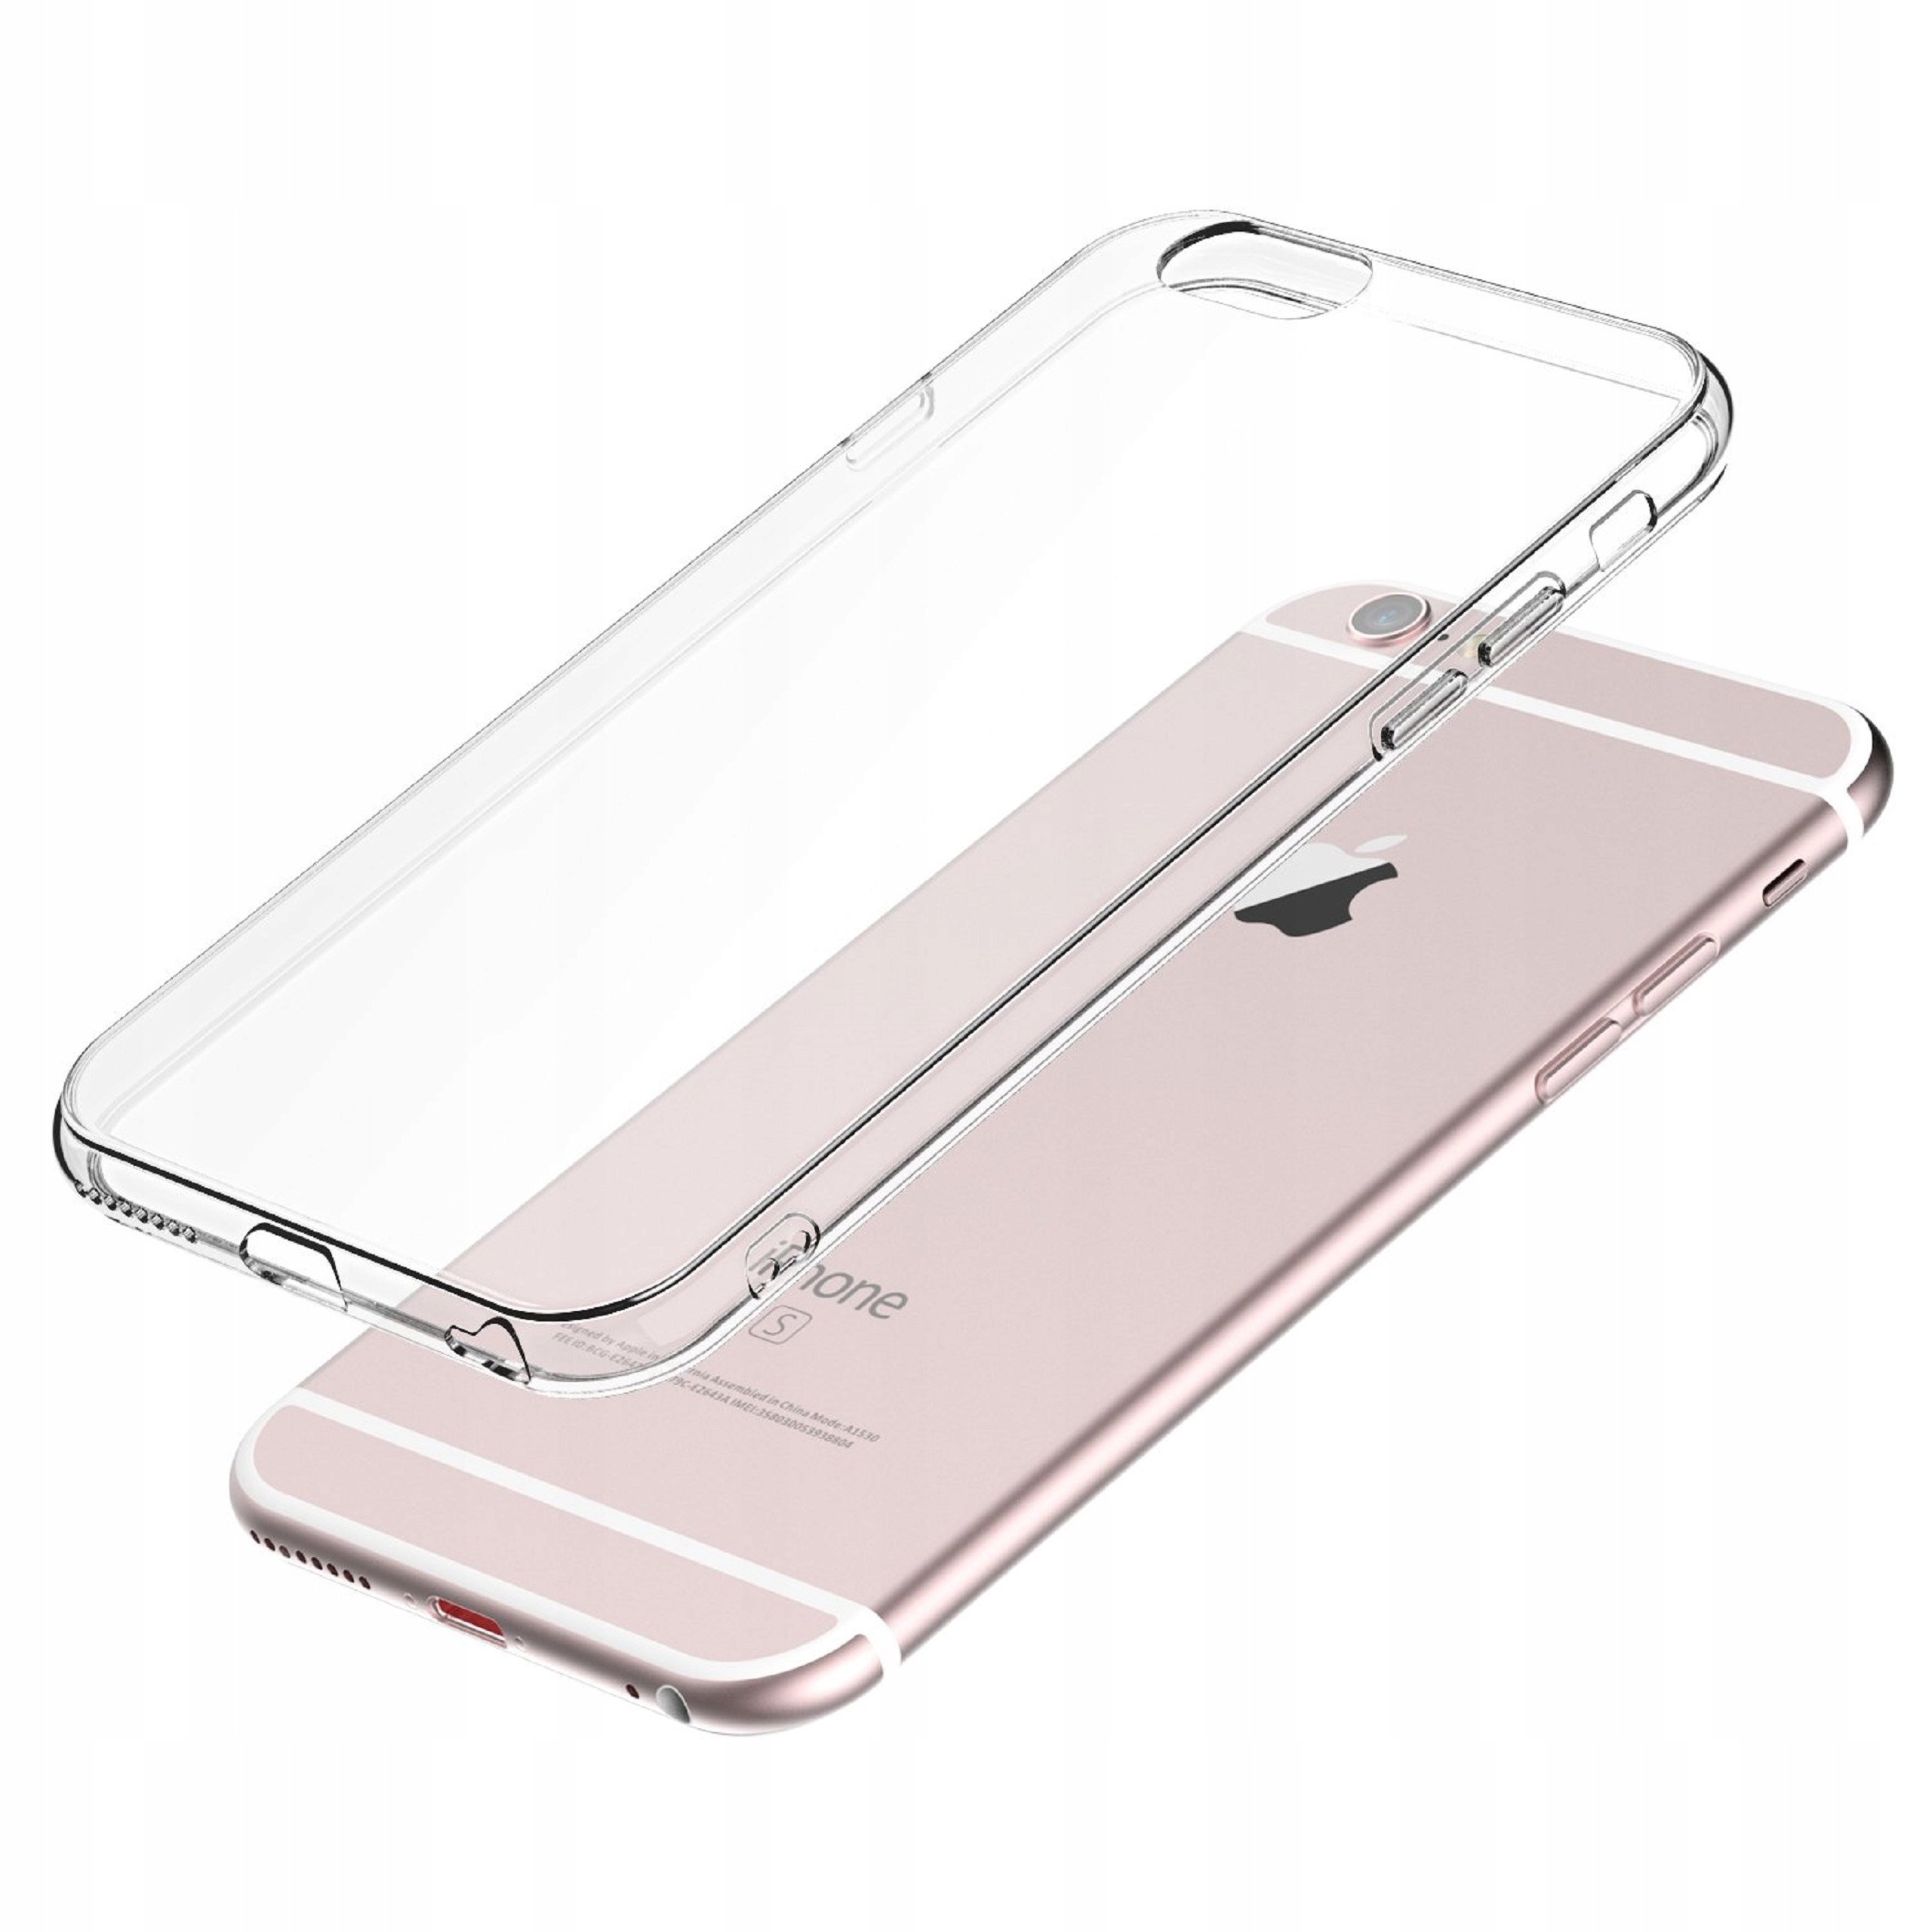 Ultra SLIM CASE TRANSPARENT for IPHONE 6 6S fargeløs